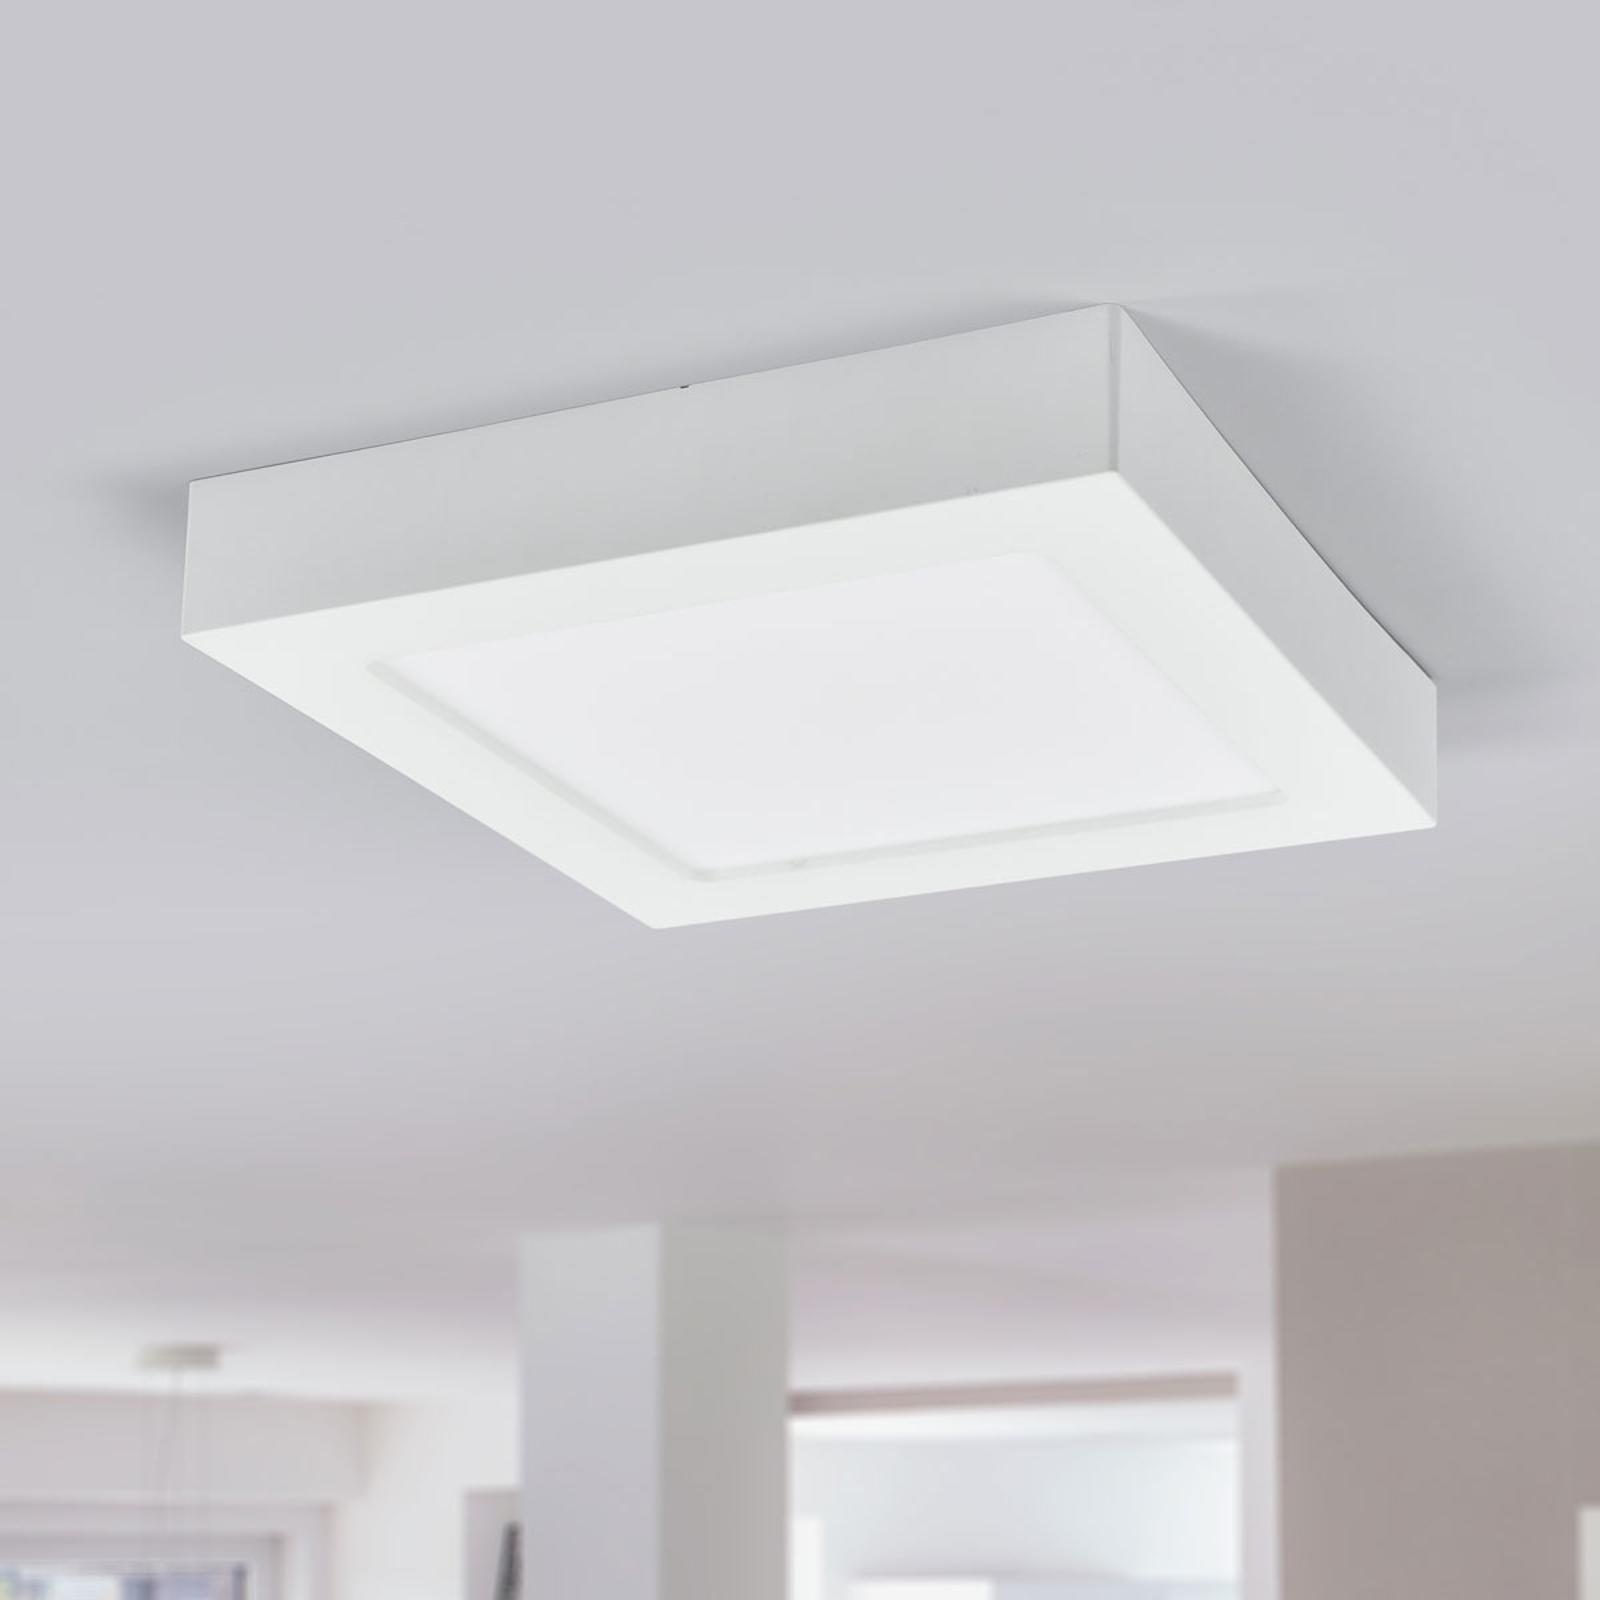 LED-taklampe Marlo, hvit, 4000K kantet 23,1cm